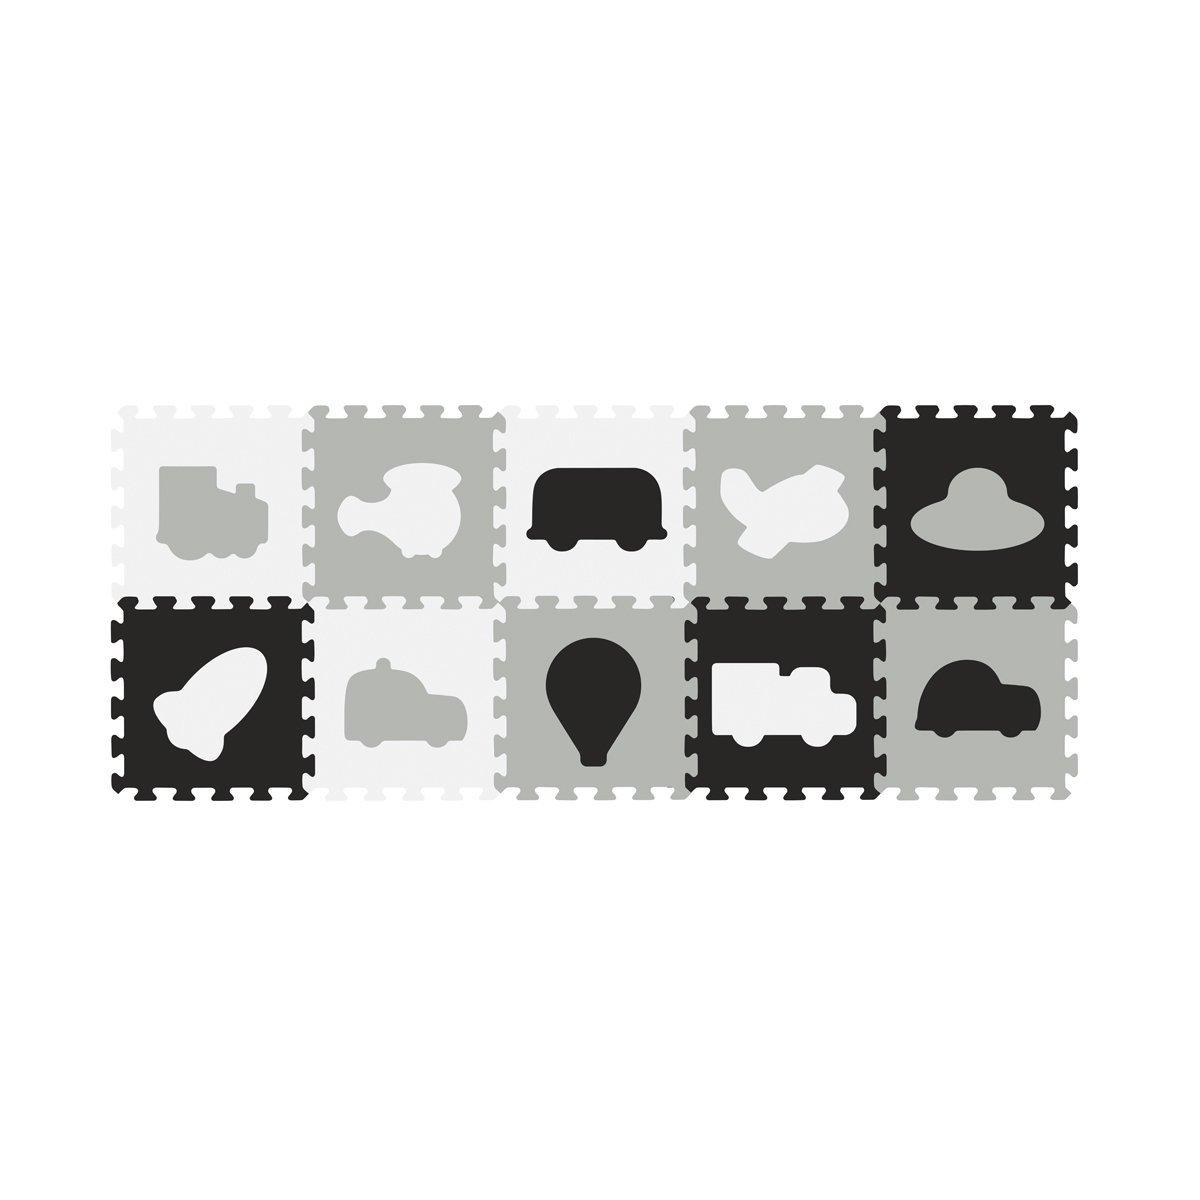 P�nov� puzzle 10 ks dopravn� prost�edky 30x30ccm - zv��i� obr�zok